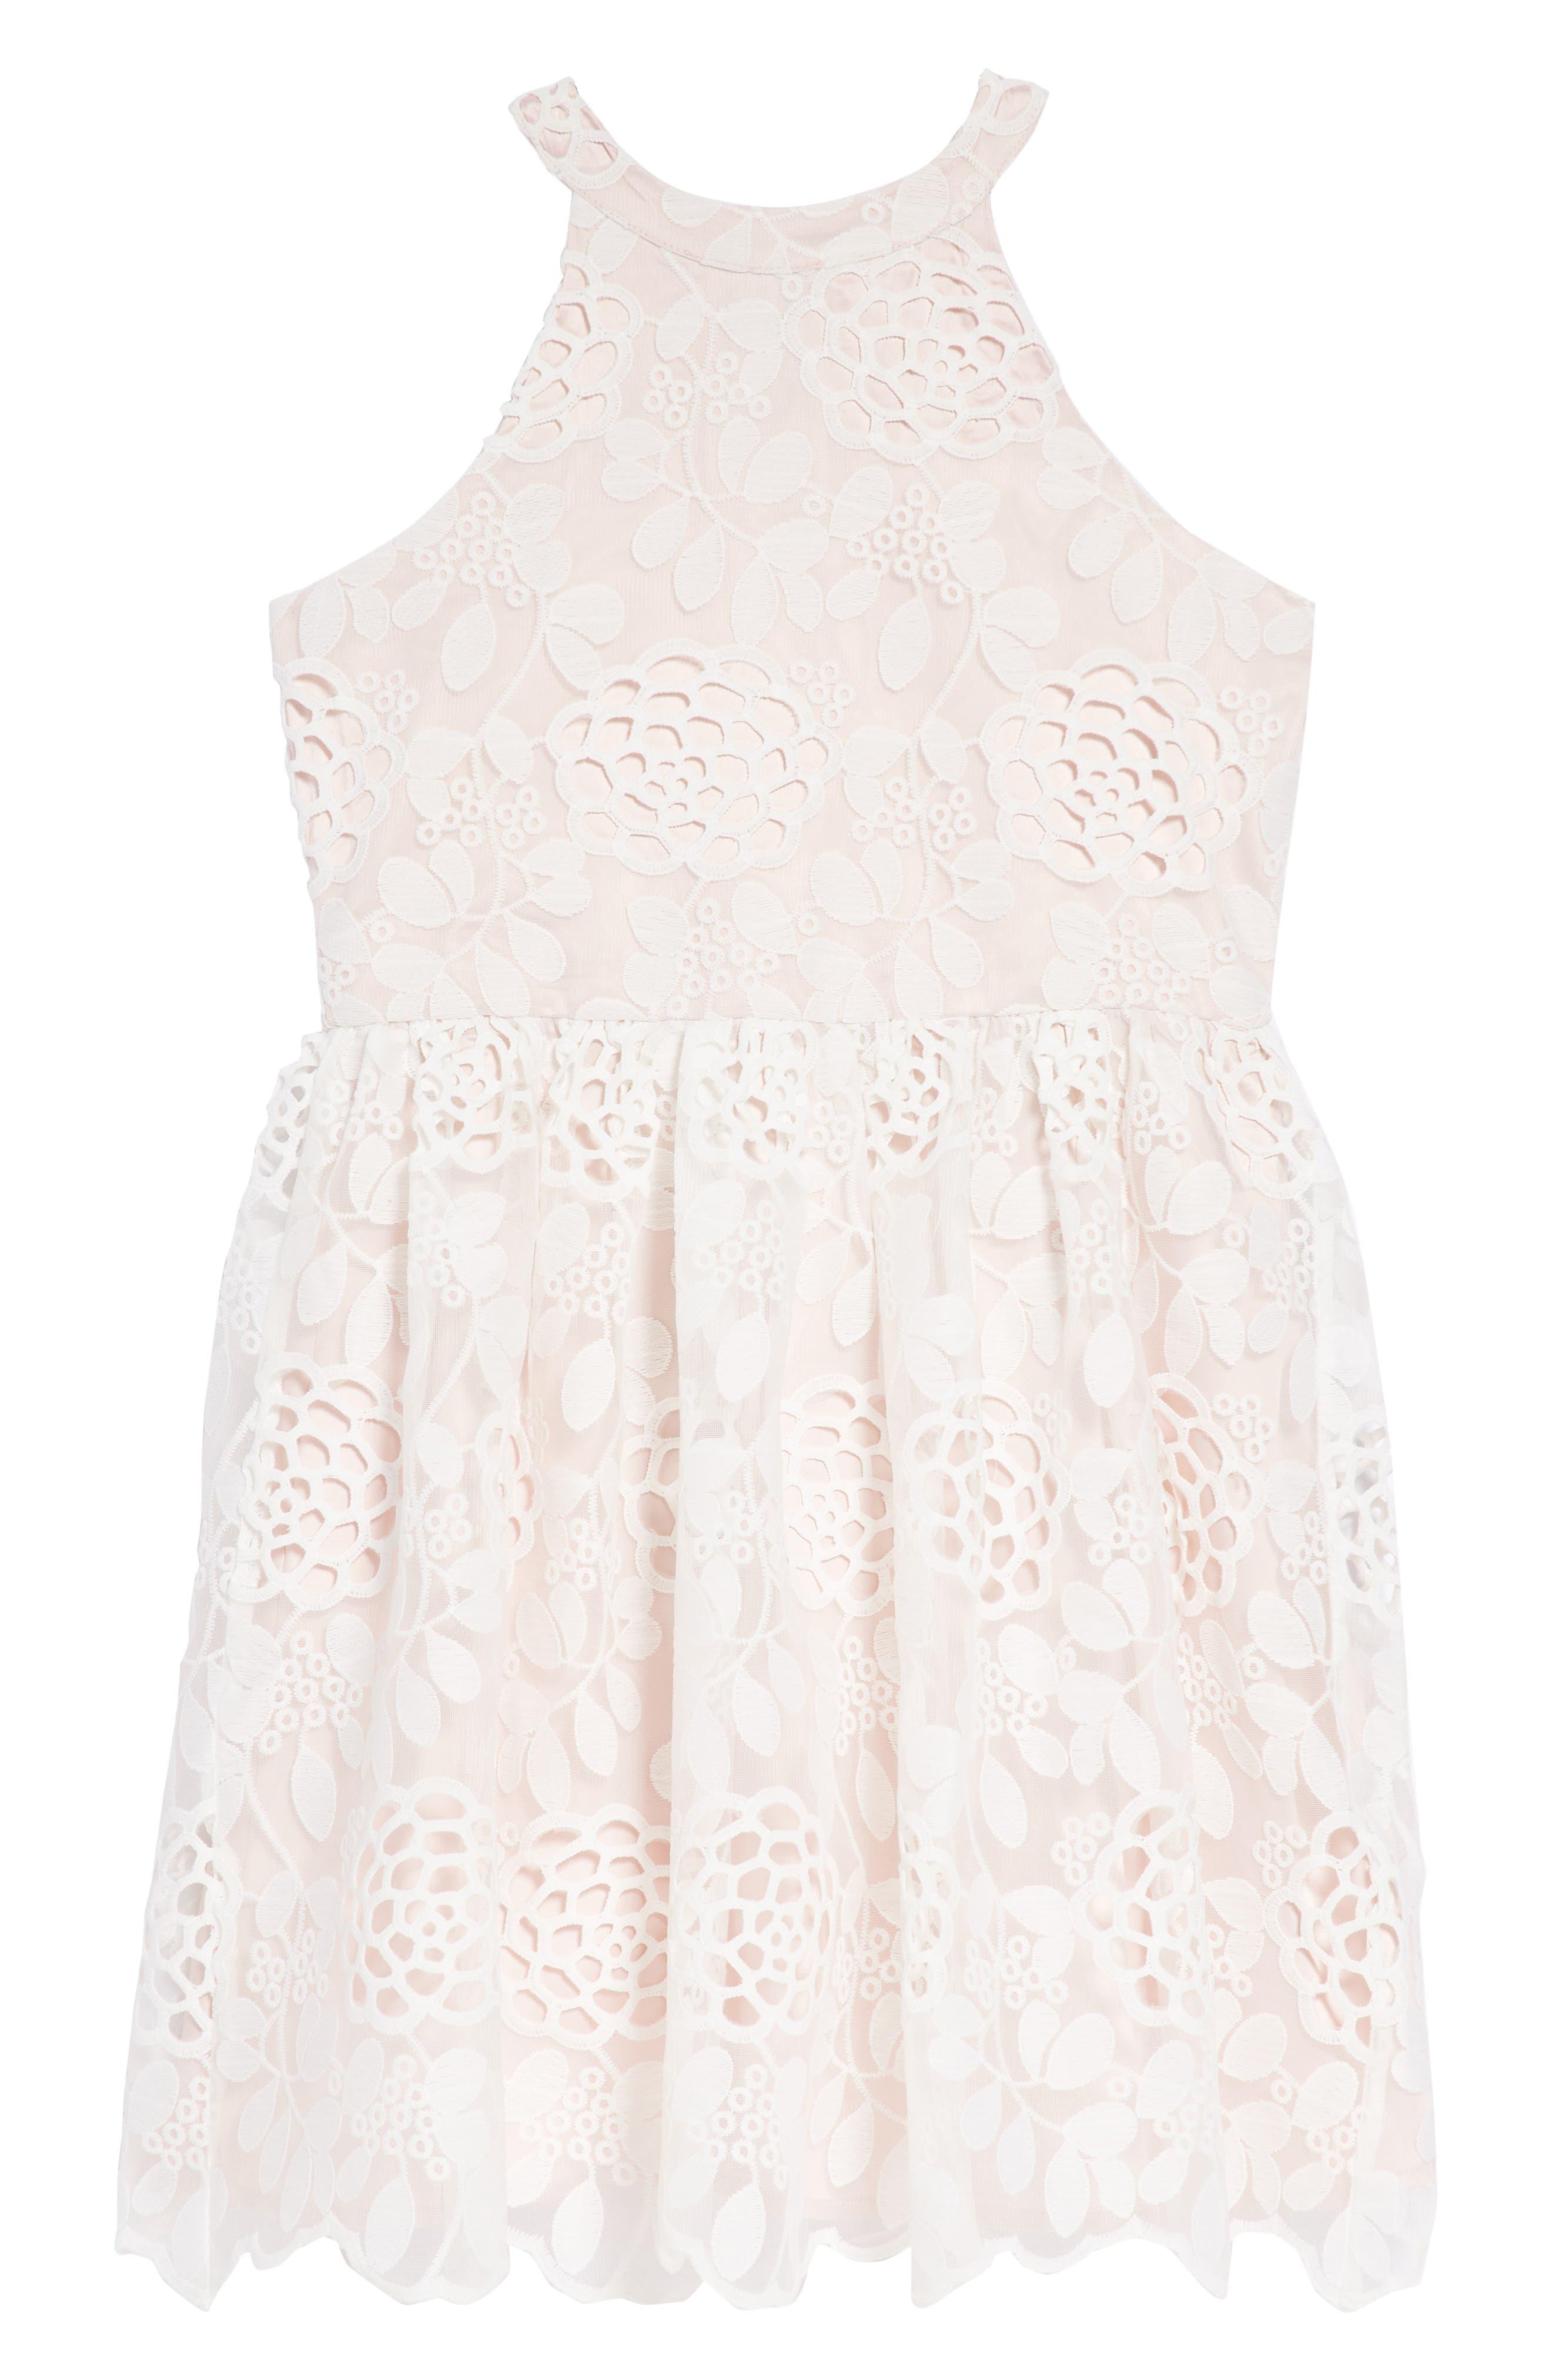 Primrose Lace Dress,                             Main thumbnail 1, color,                             Orchid White